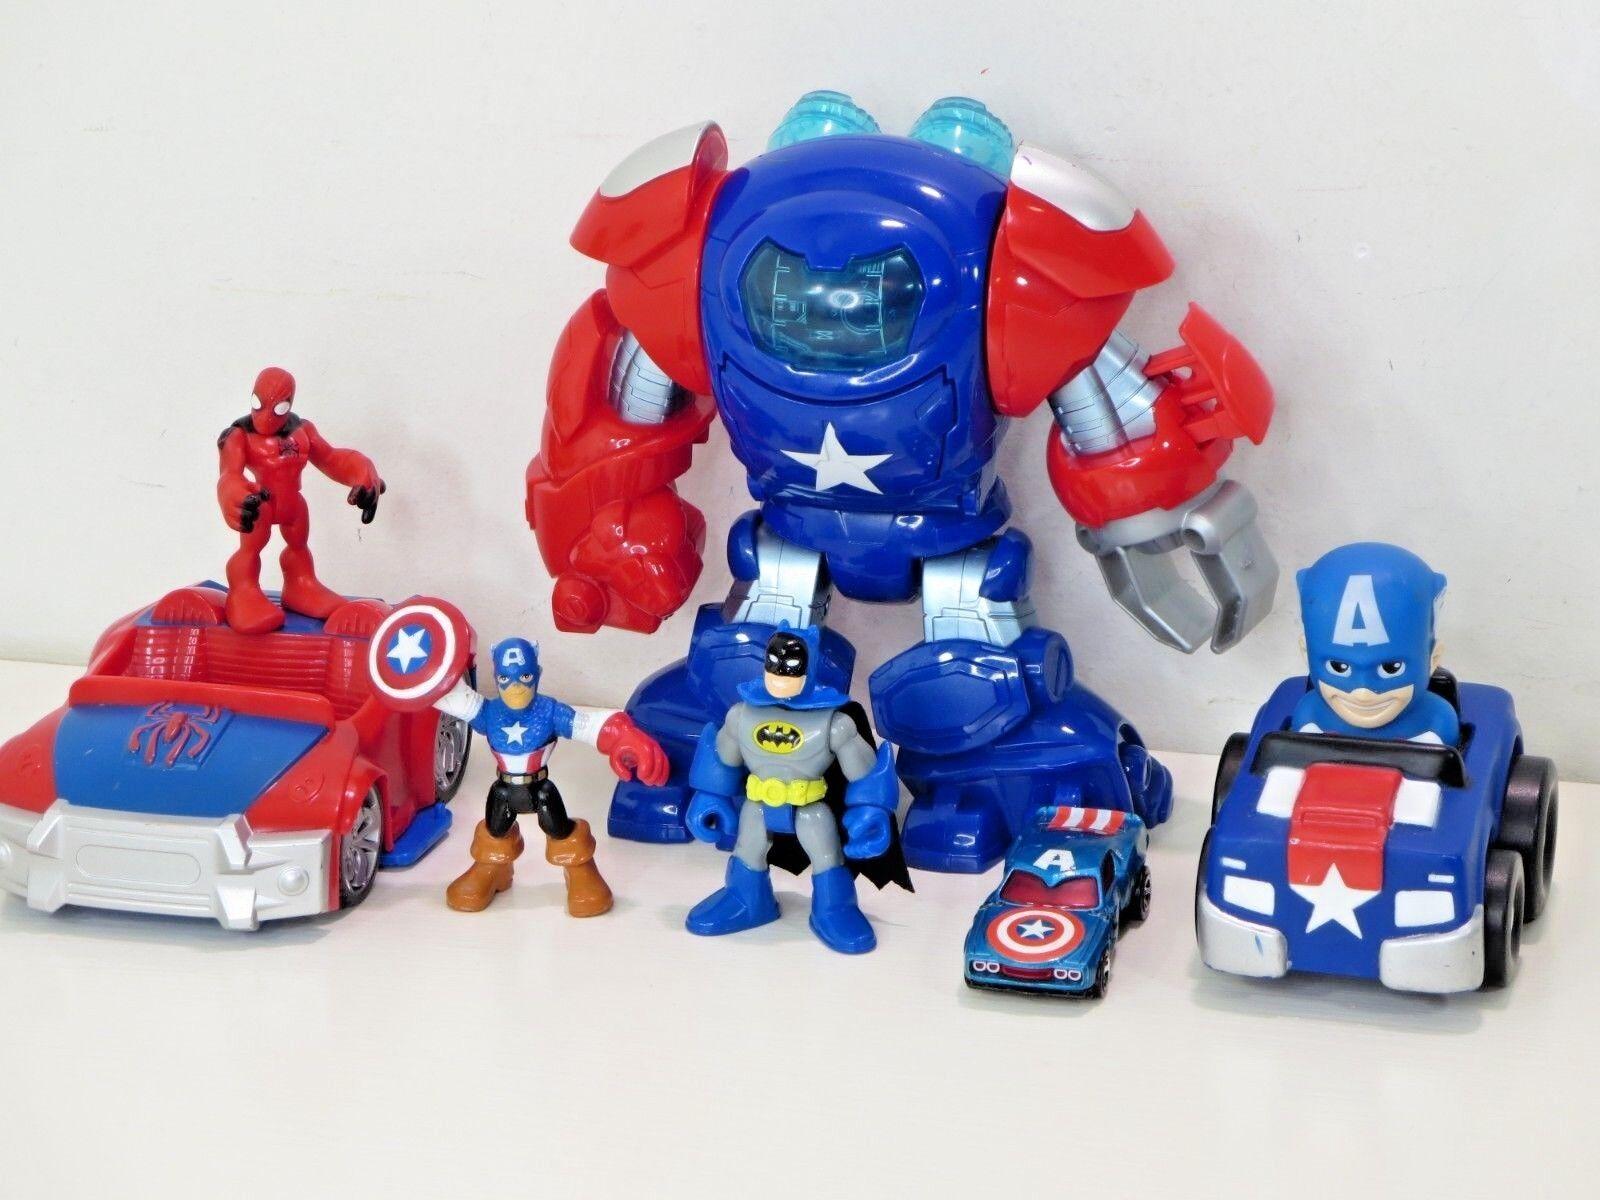 Playskool Heroes Super Hero Space Command Armor Captain America Robot Spiderman